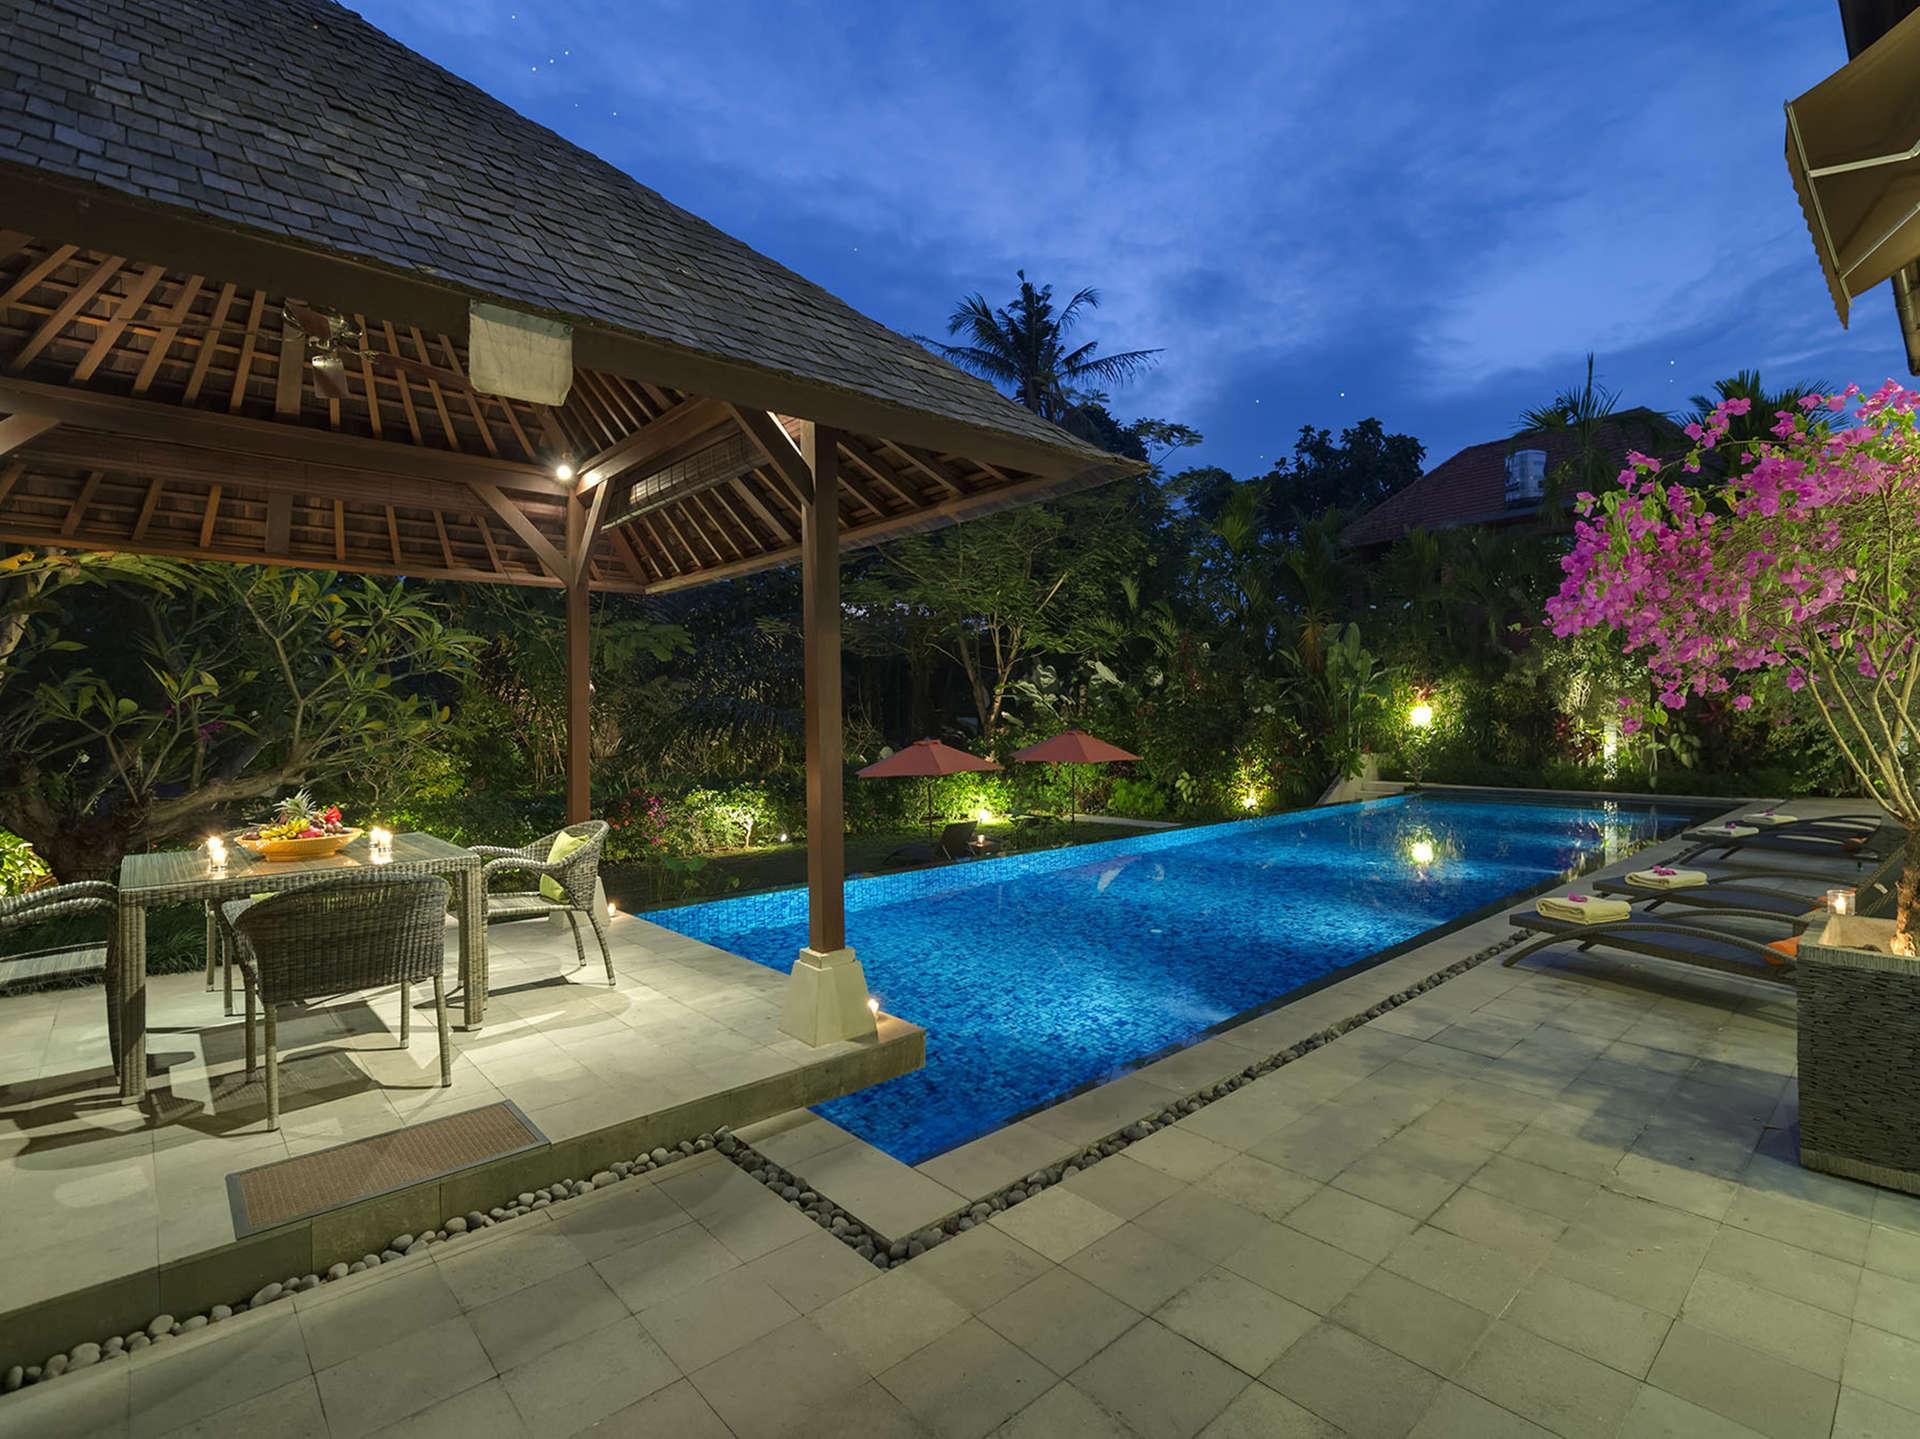 Luxury villa rentals asia - Indonesia - Bali - Ubud - Shinta Dewi - Image 1/24